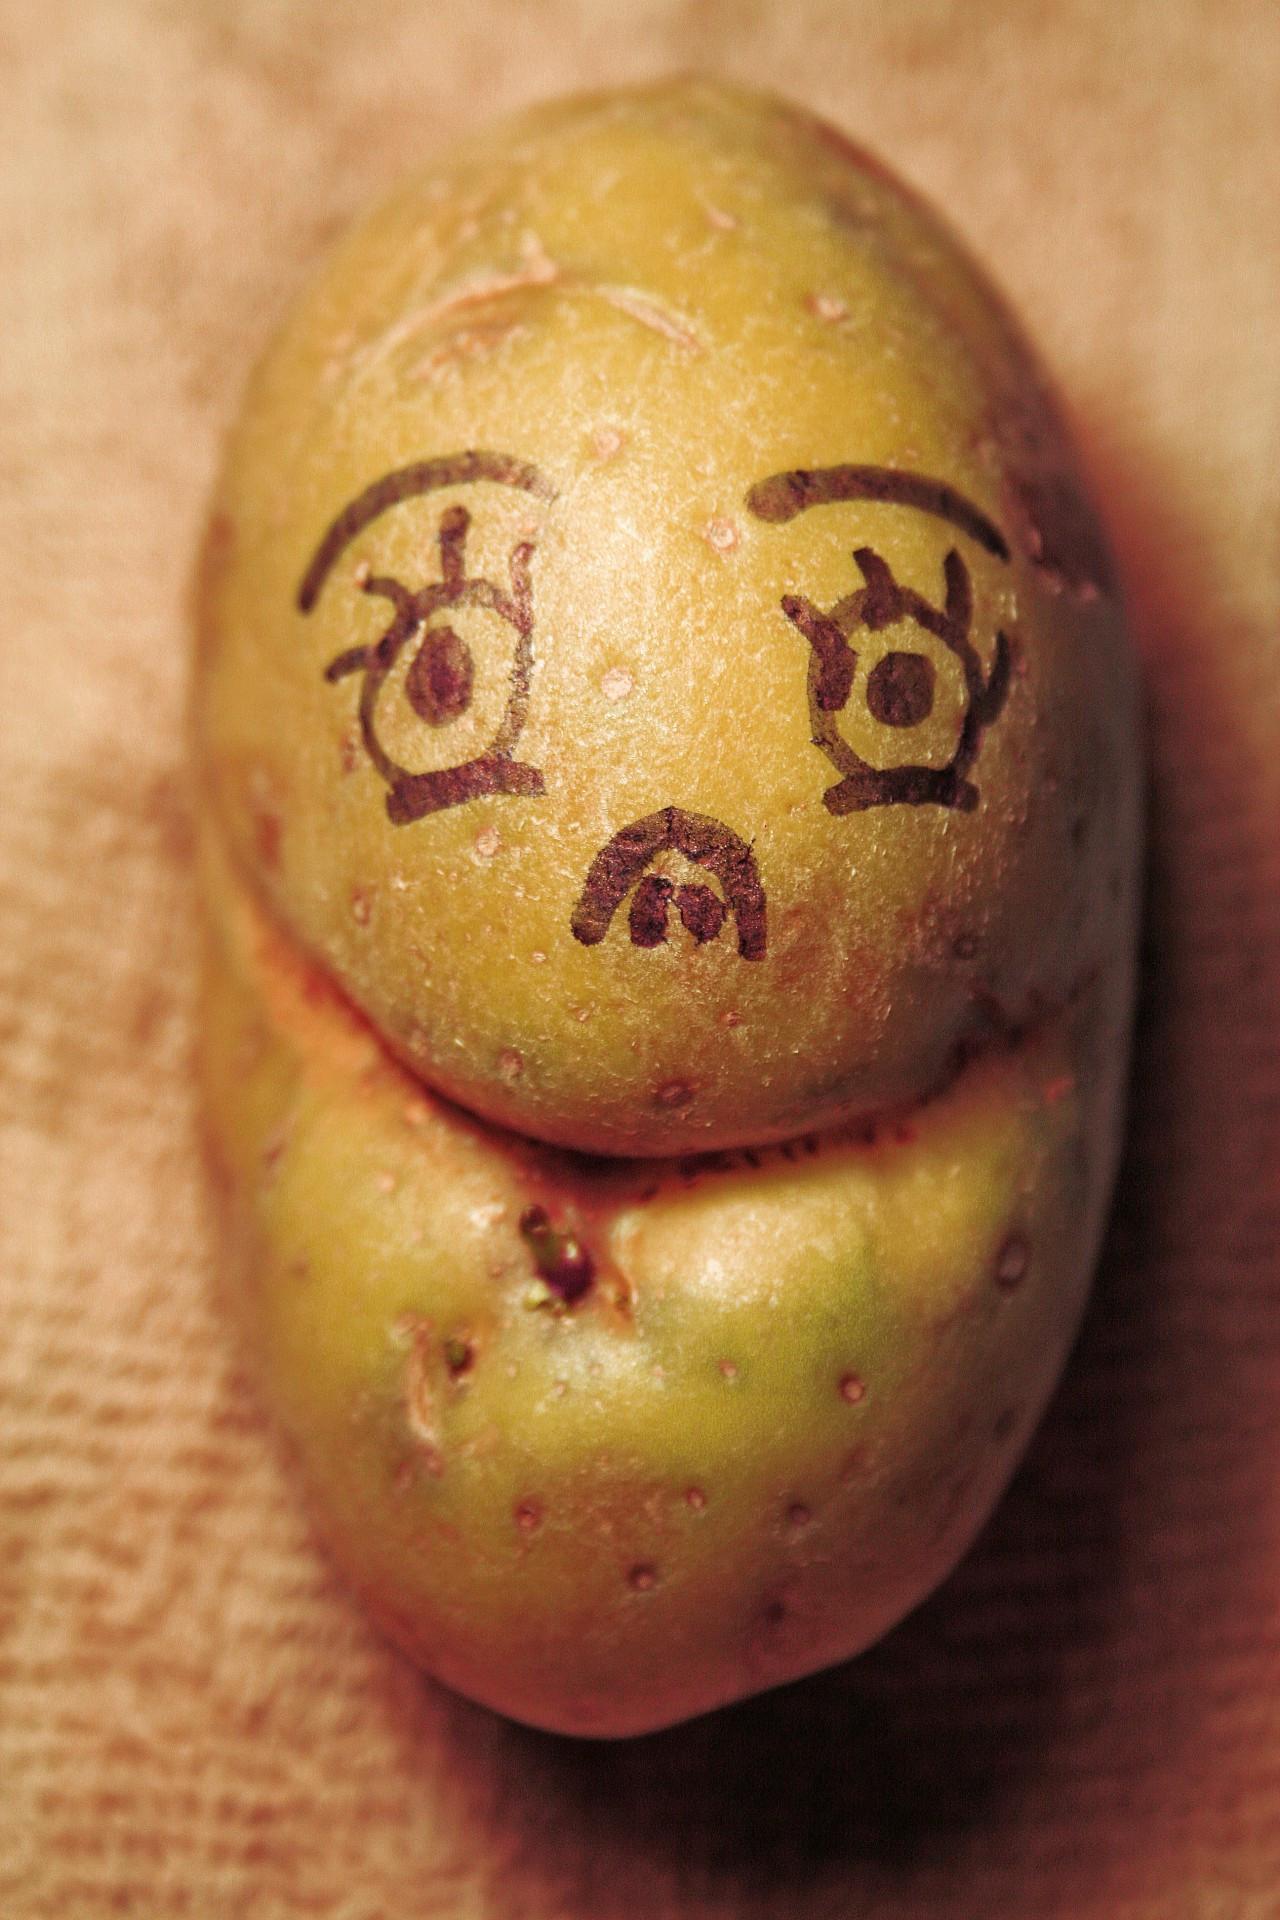 Potato With A Face  Mr Potato Head